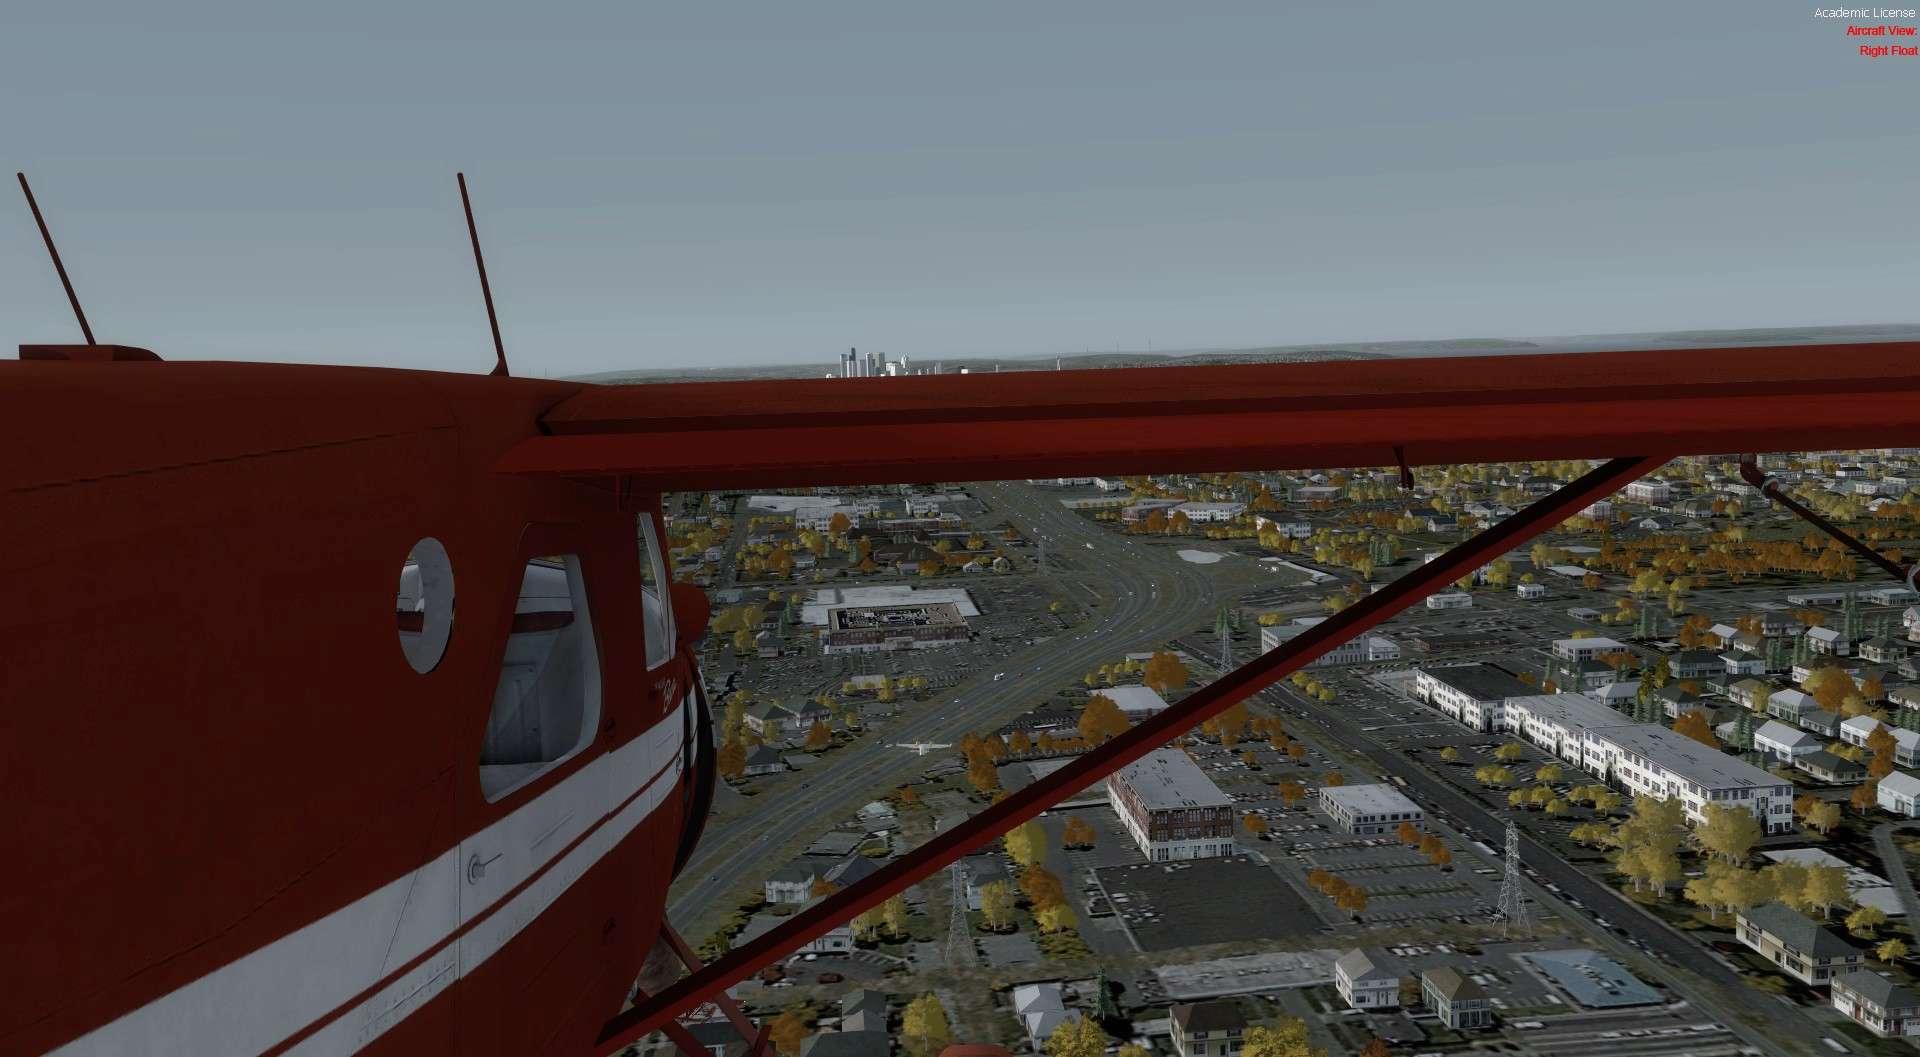 Compte rendu du vol Kenmore Air Harbor (W55) à Kenmore Air Harbor (W55) 2017-119